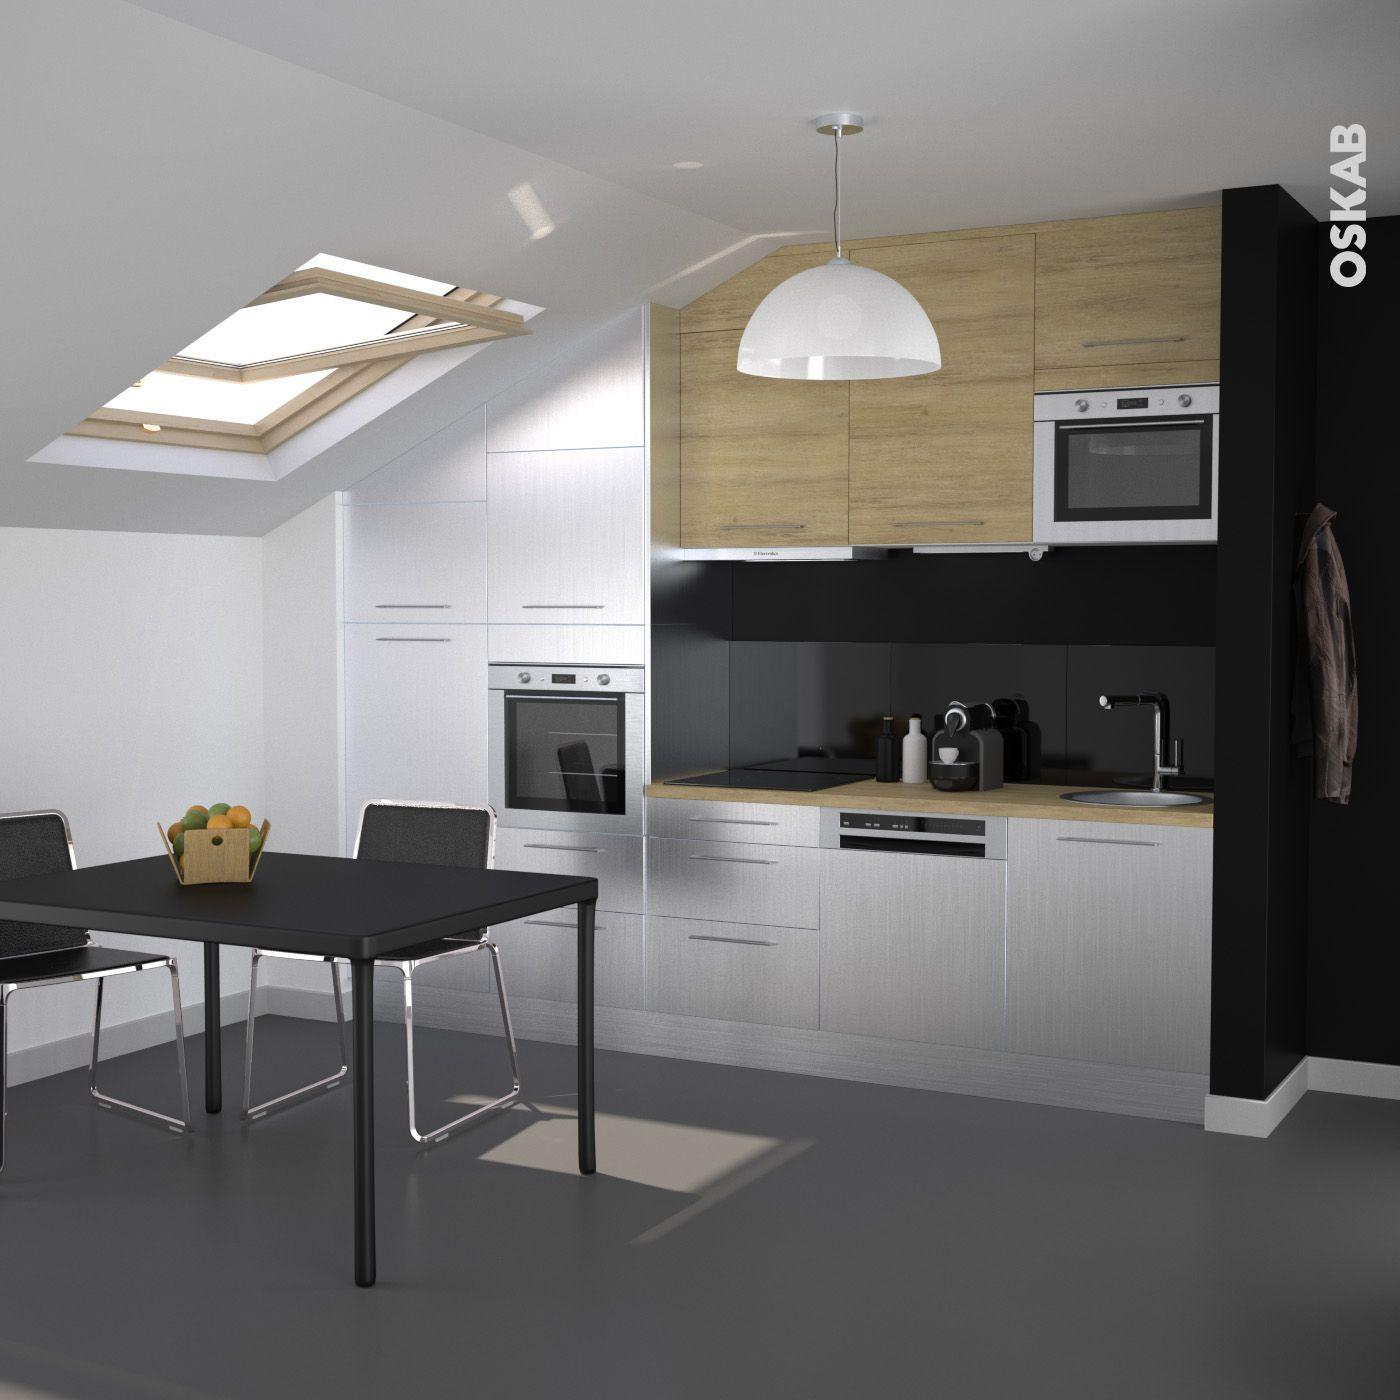 petite cuisine design inox et bois ch ne naturel implantation en i sous combles cr dence. Black Bedroom Furniture Sets. Home Design Ideas